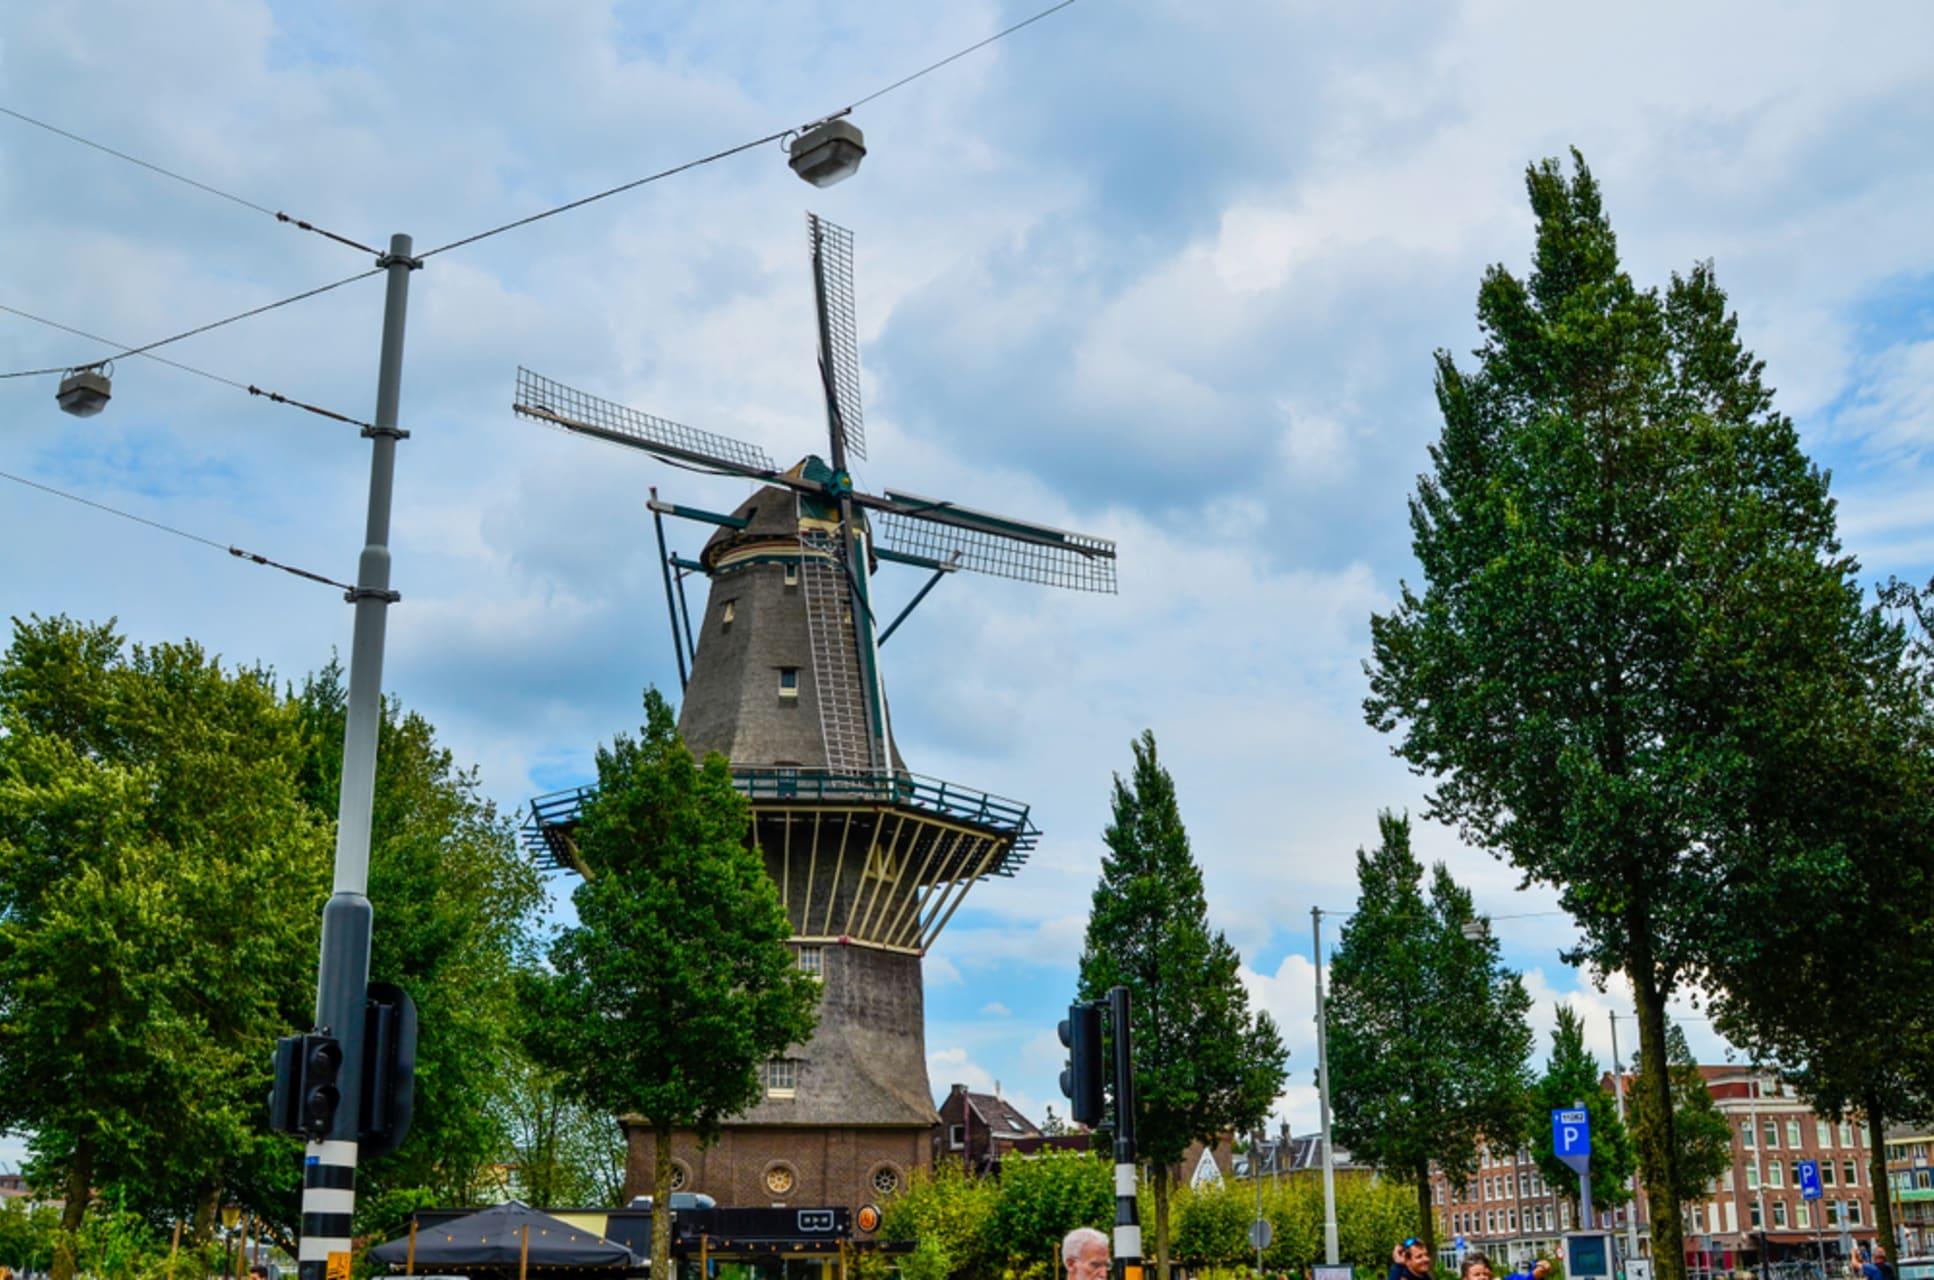 Amsterdam - Windmill, Market & Multiculturalism in East Amsterdam